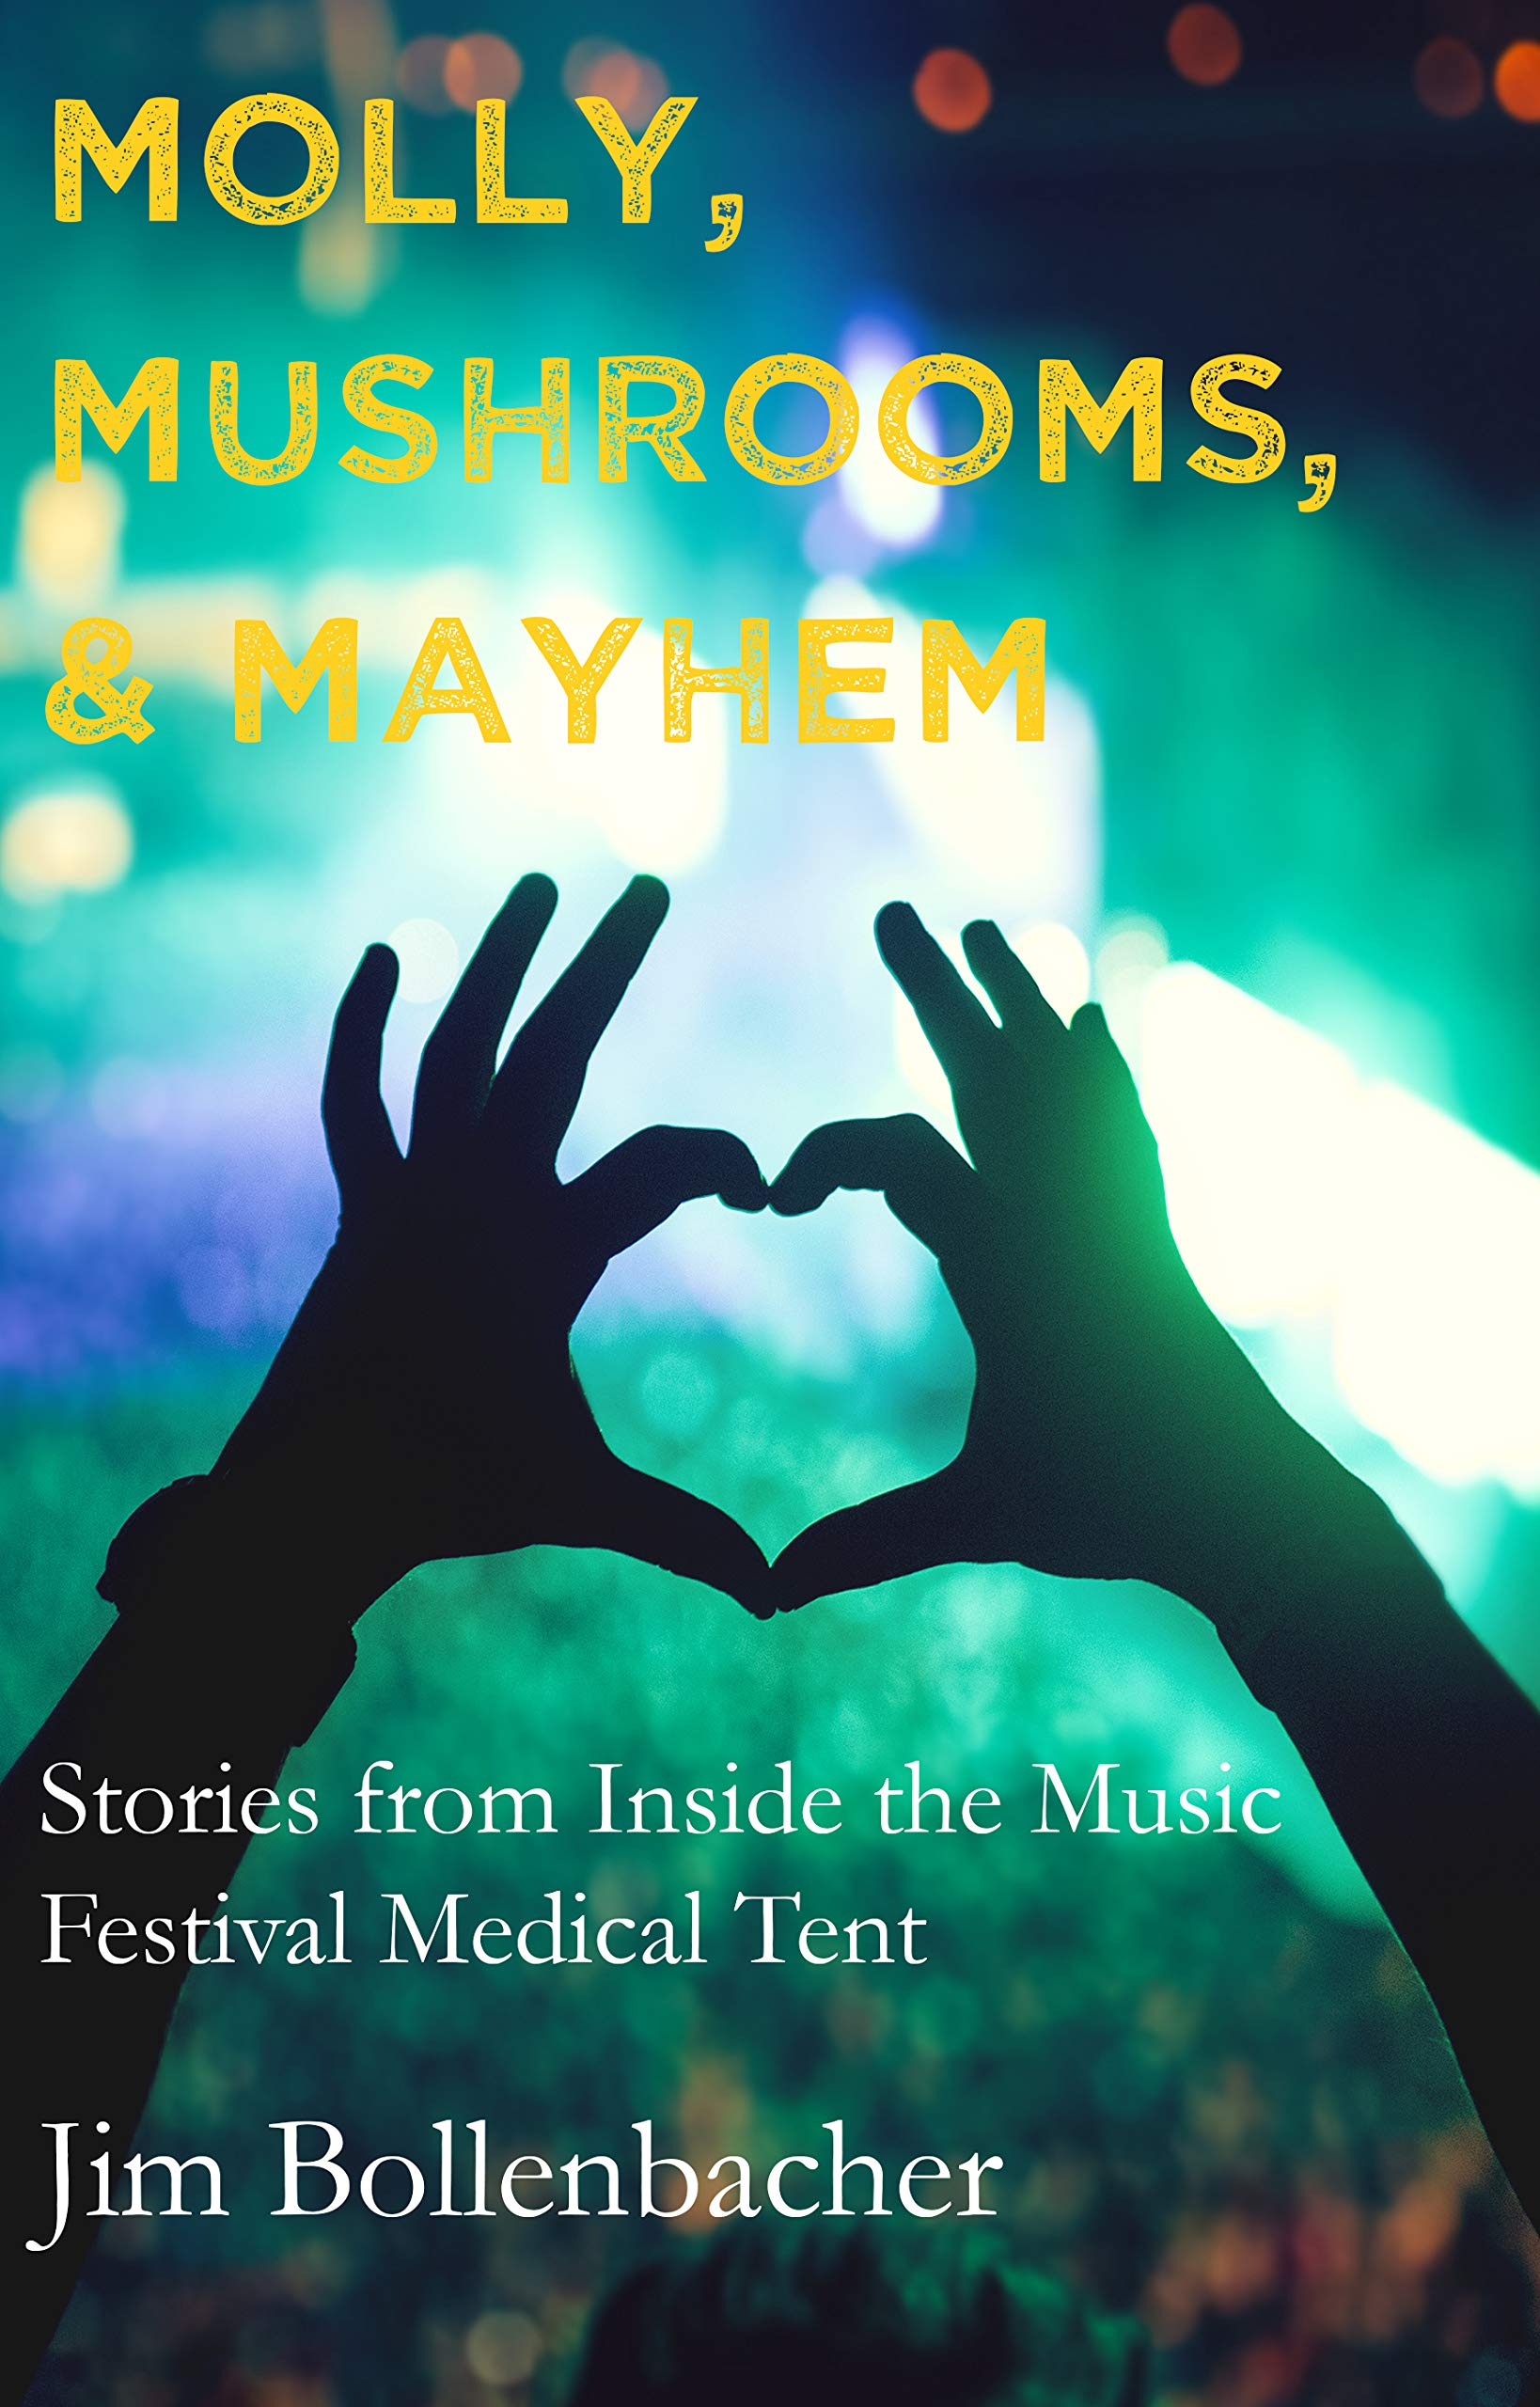 Molly, Mushrooms, & Mayhem: Stories from Inside the Music Festival Medical Tent